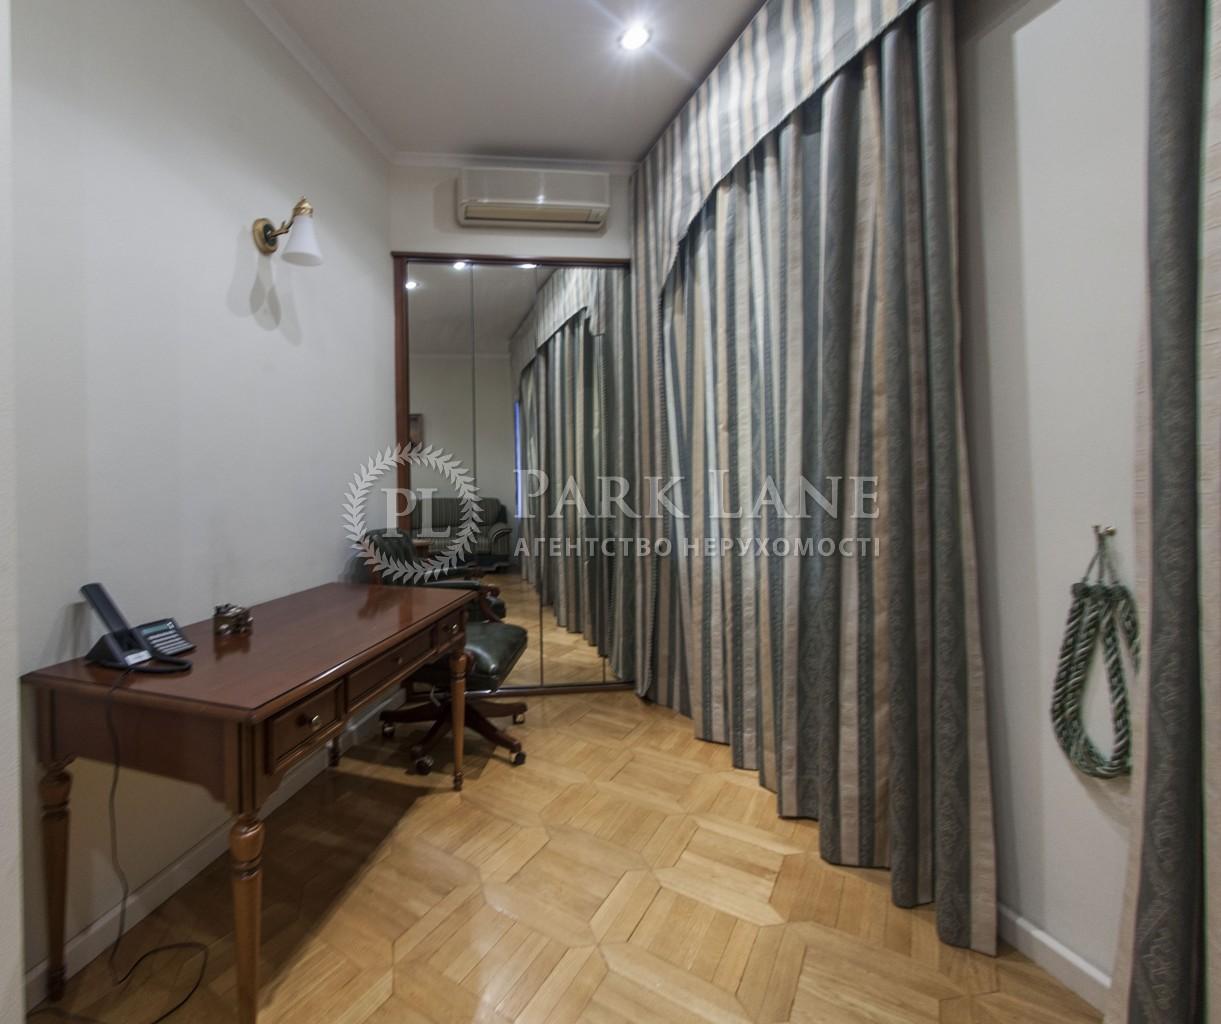 Квартира ул. Институтская, 24/7, Киев, Z-1548769 - Фото 10